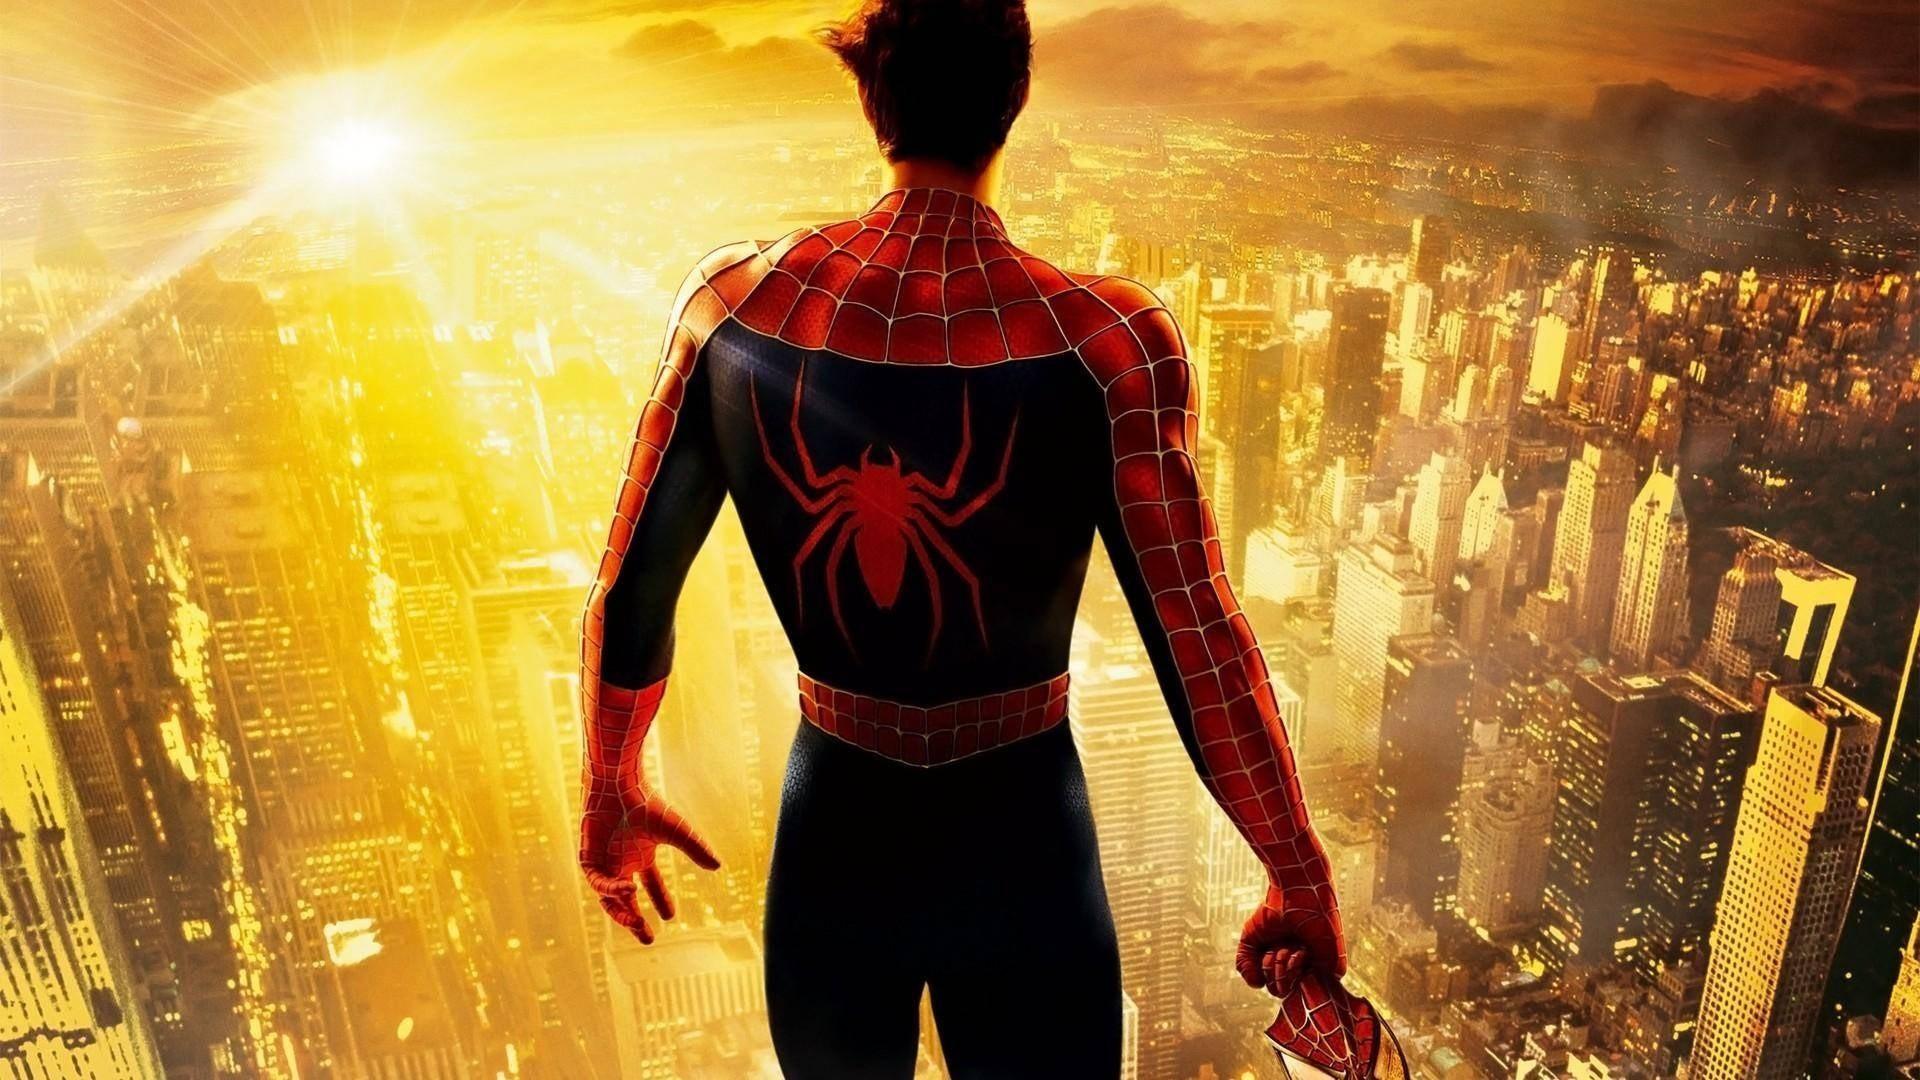 spiderman hd wallpapers 1080p windows